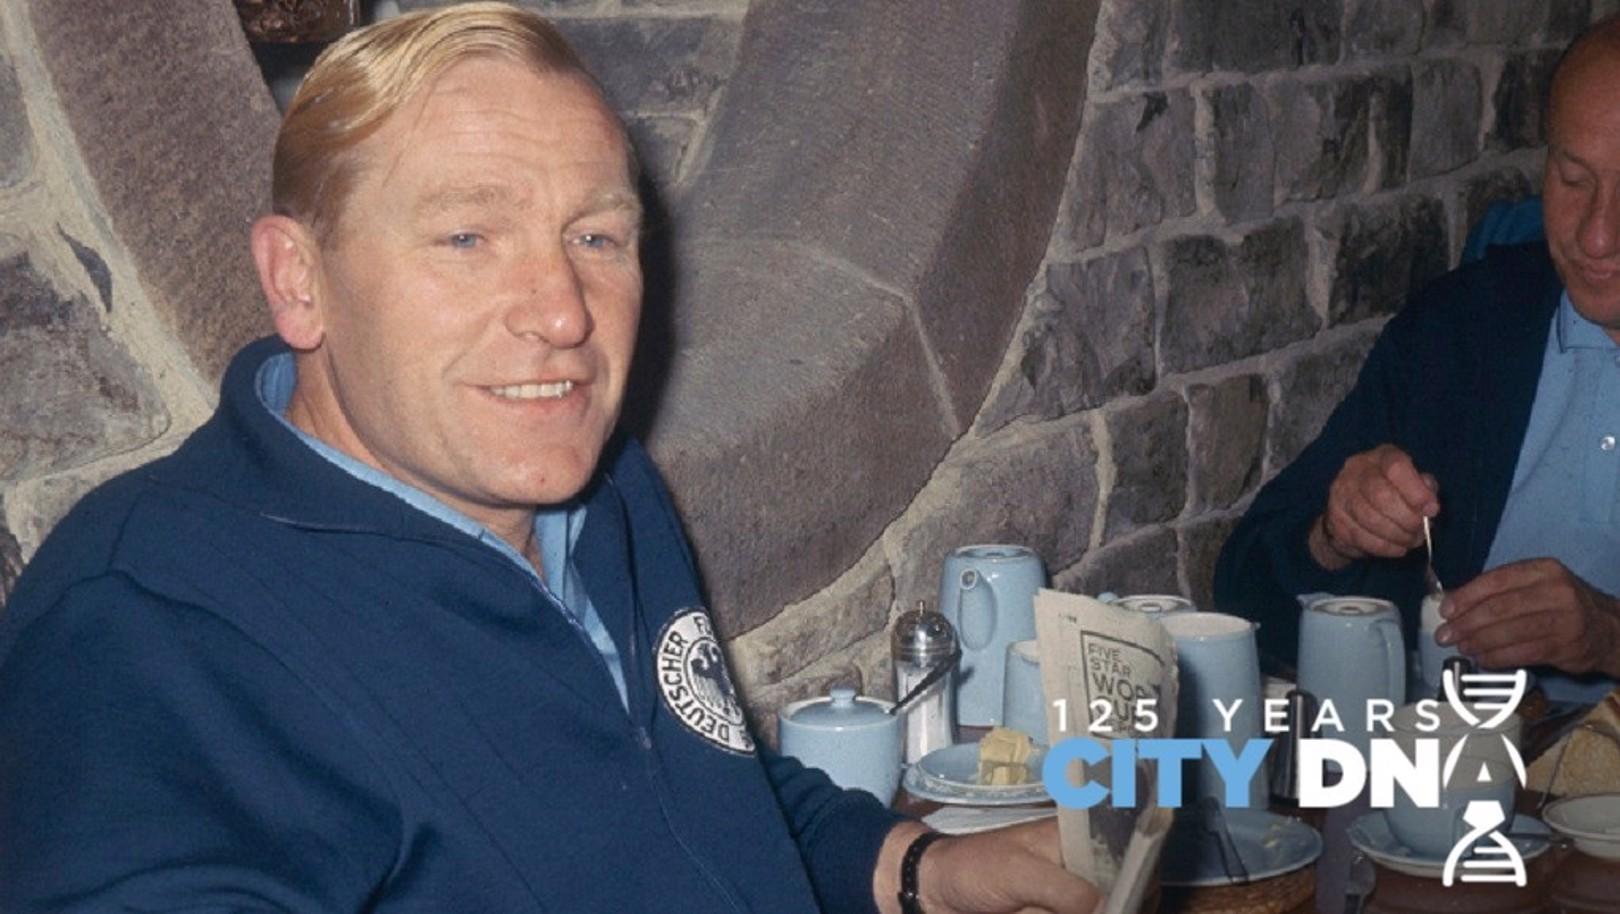 City DNA #48: The truth behind Trautmann's injury?